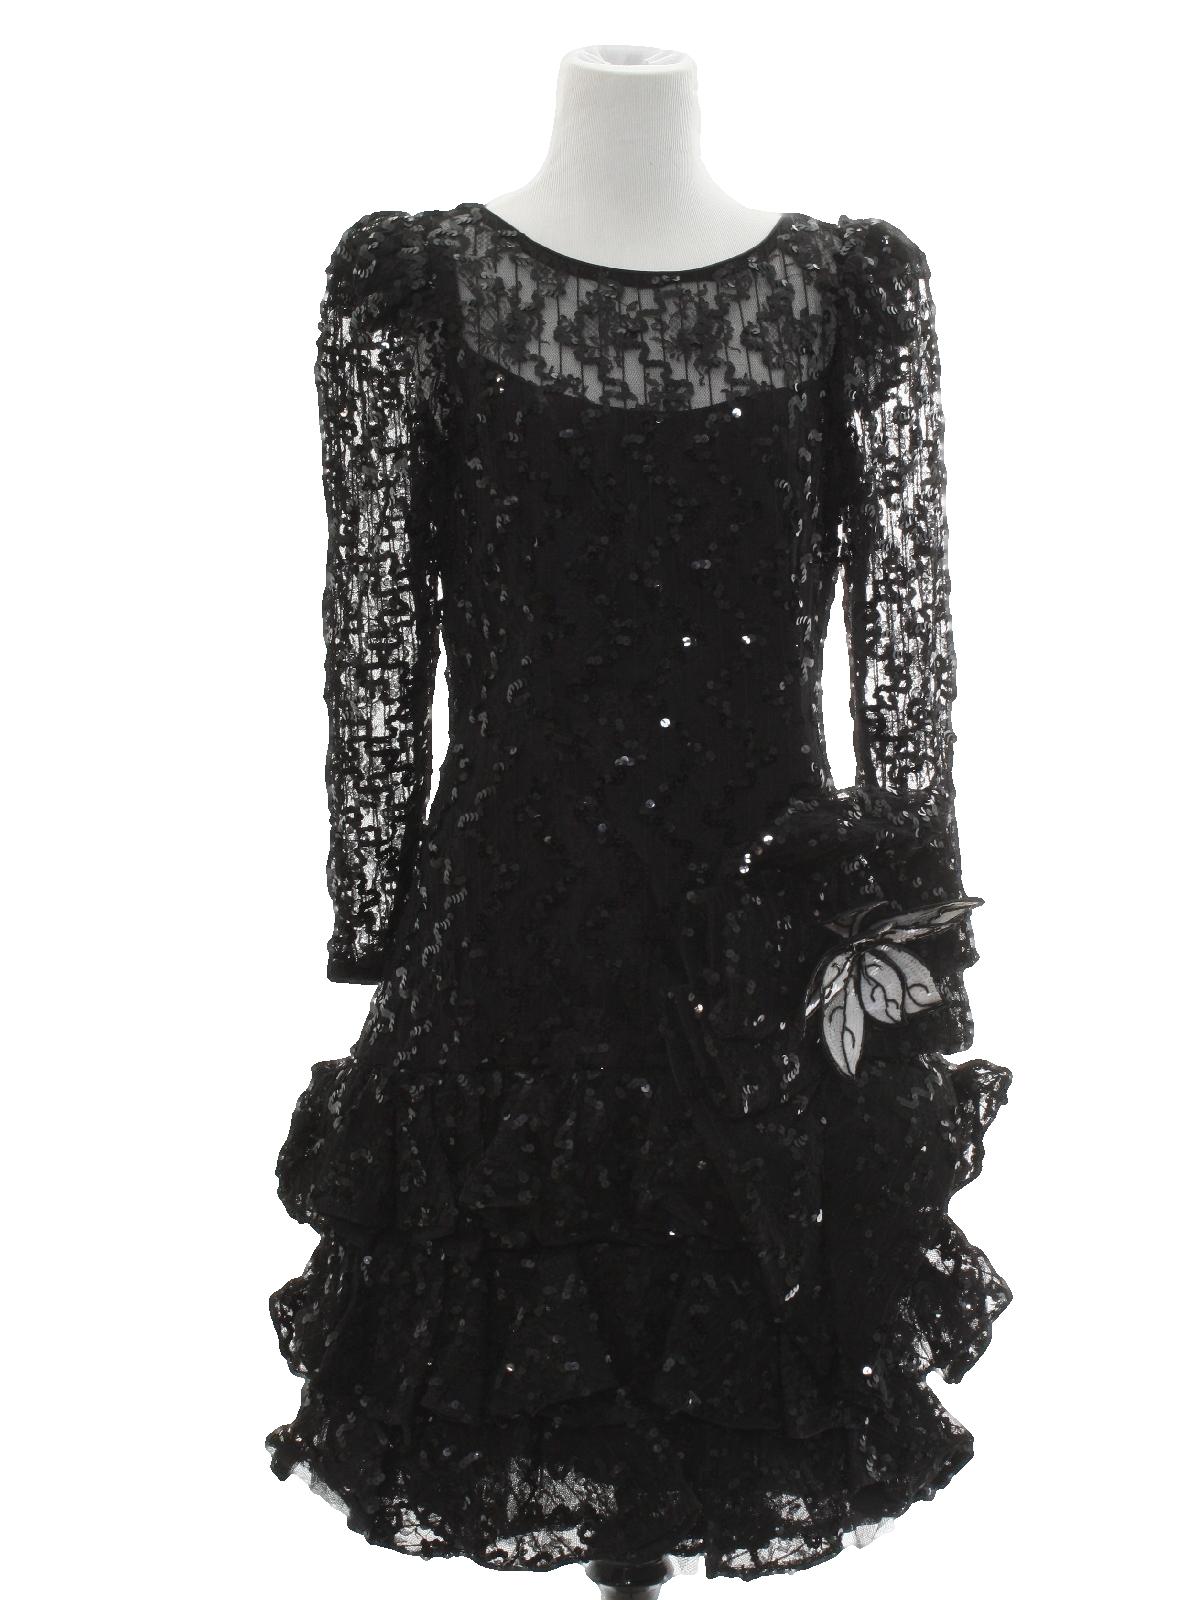 1d0e6dc7871 Retro 80 s Cocktail Dress  80s -Julie Duroche for After Five Saks ...